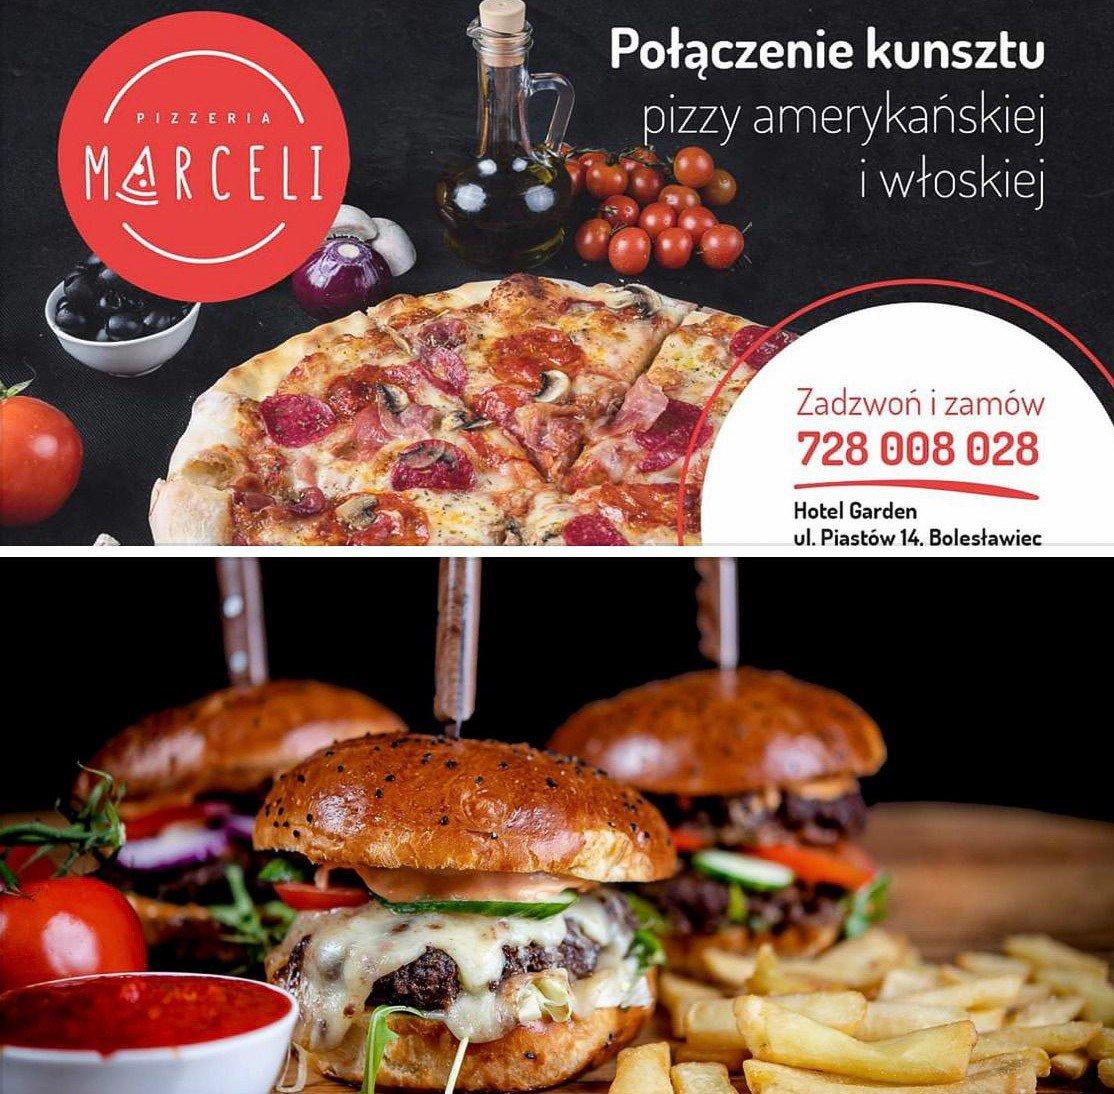 Pizzeria Marceli